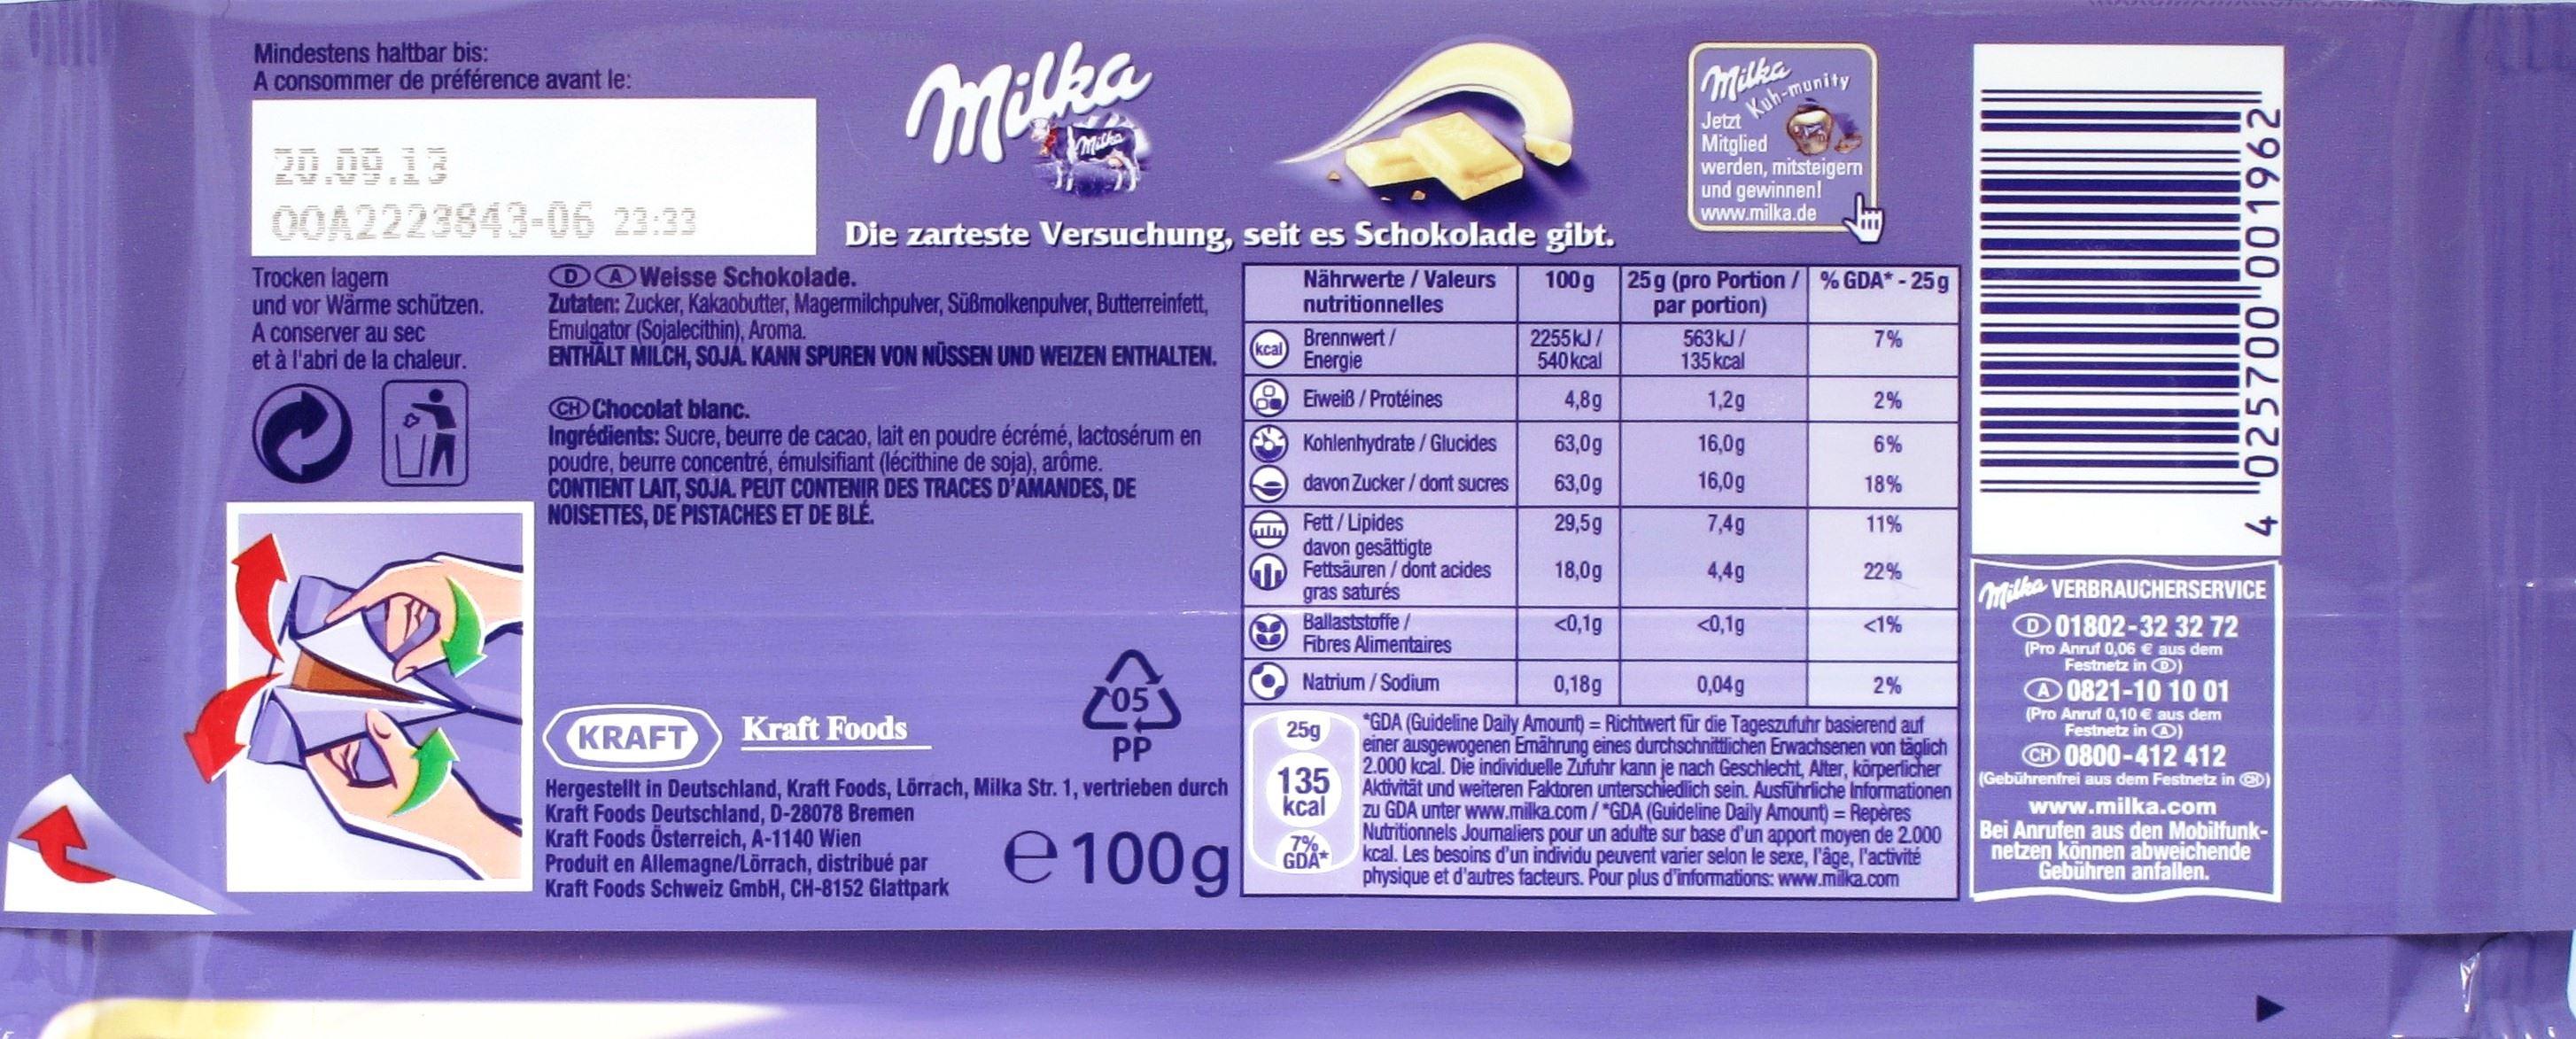 Milka / Weiße / Rückseite